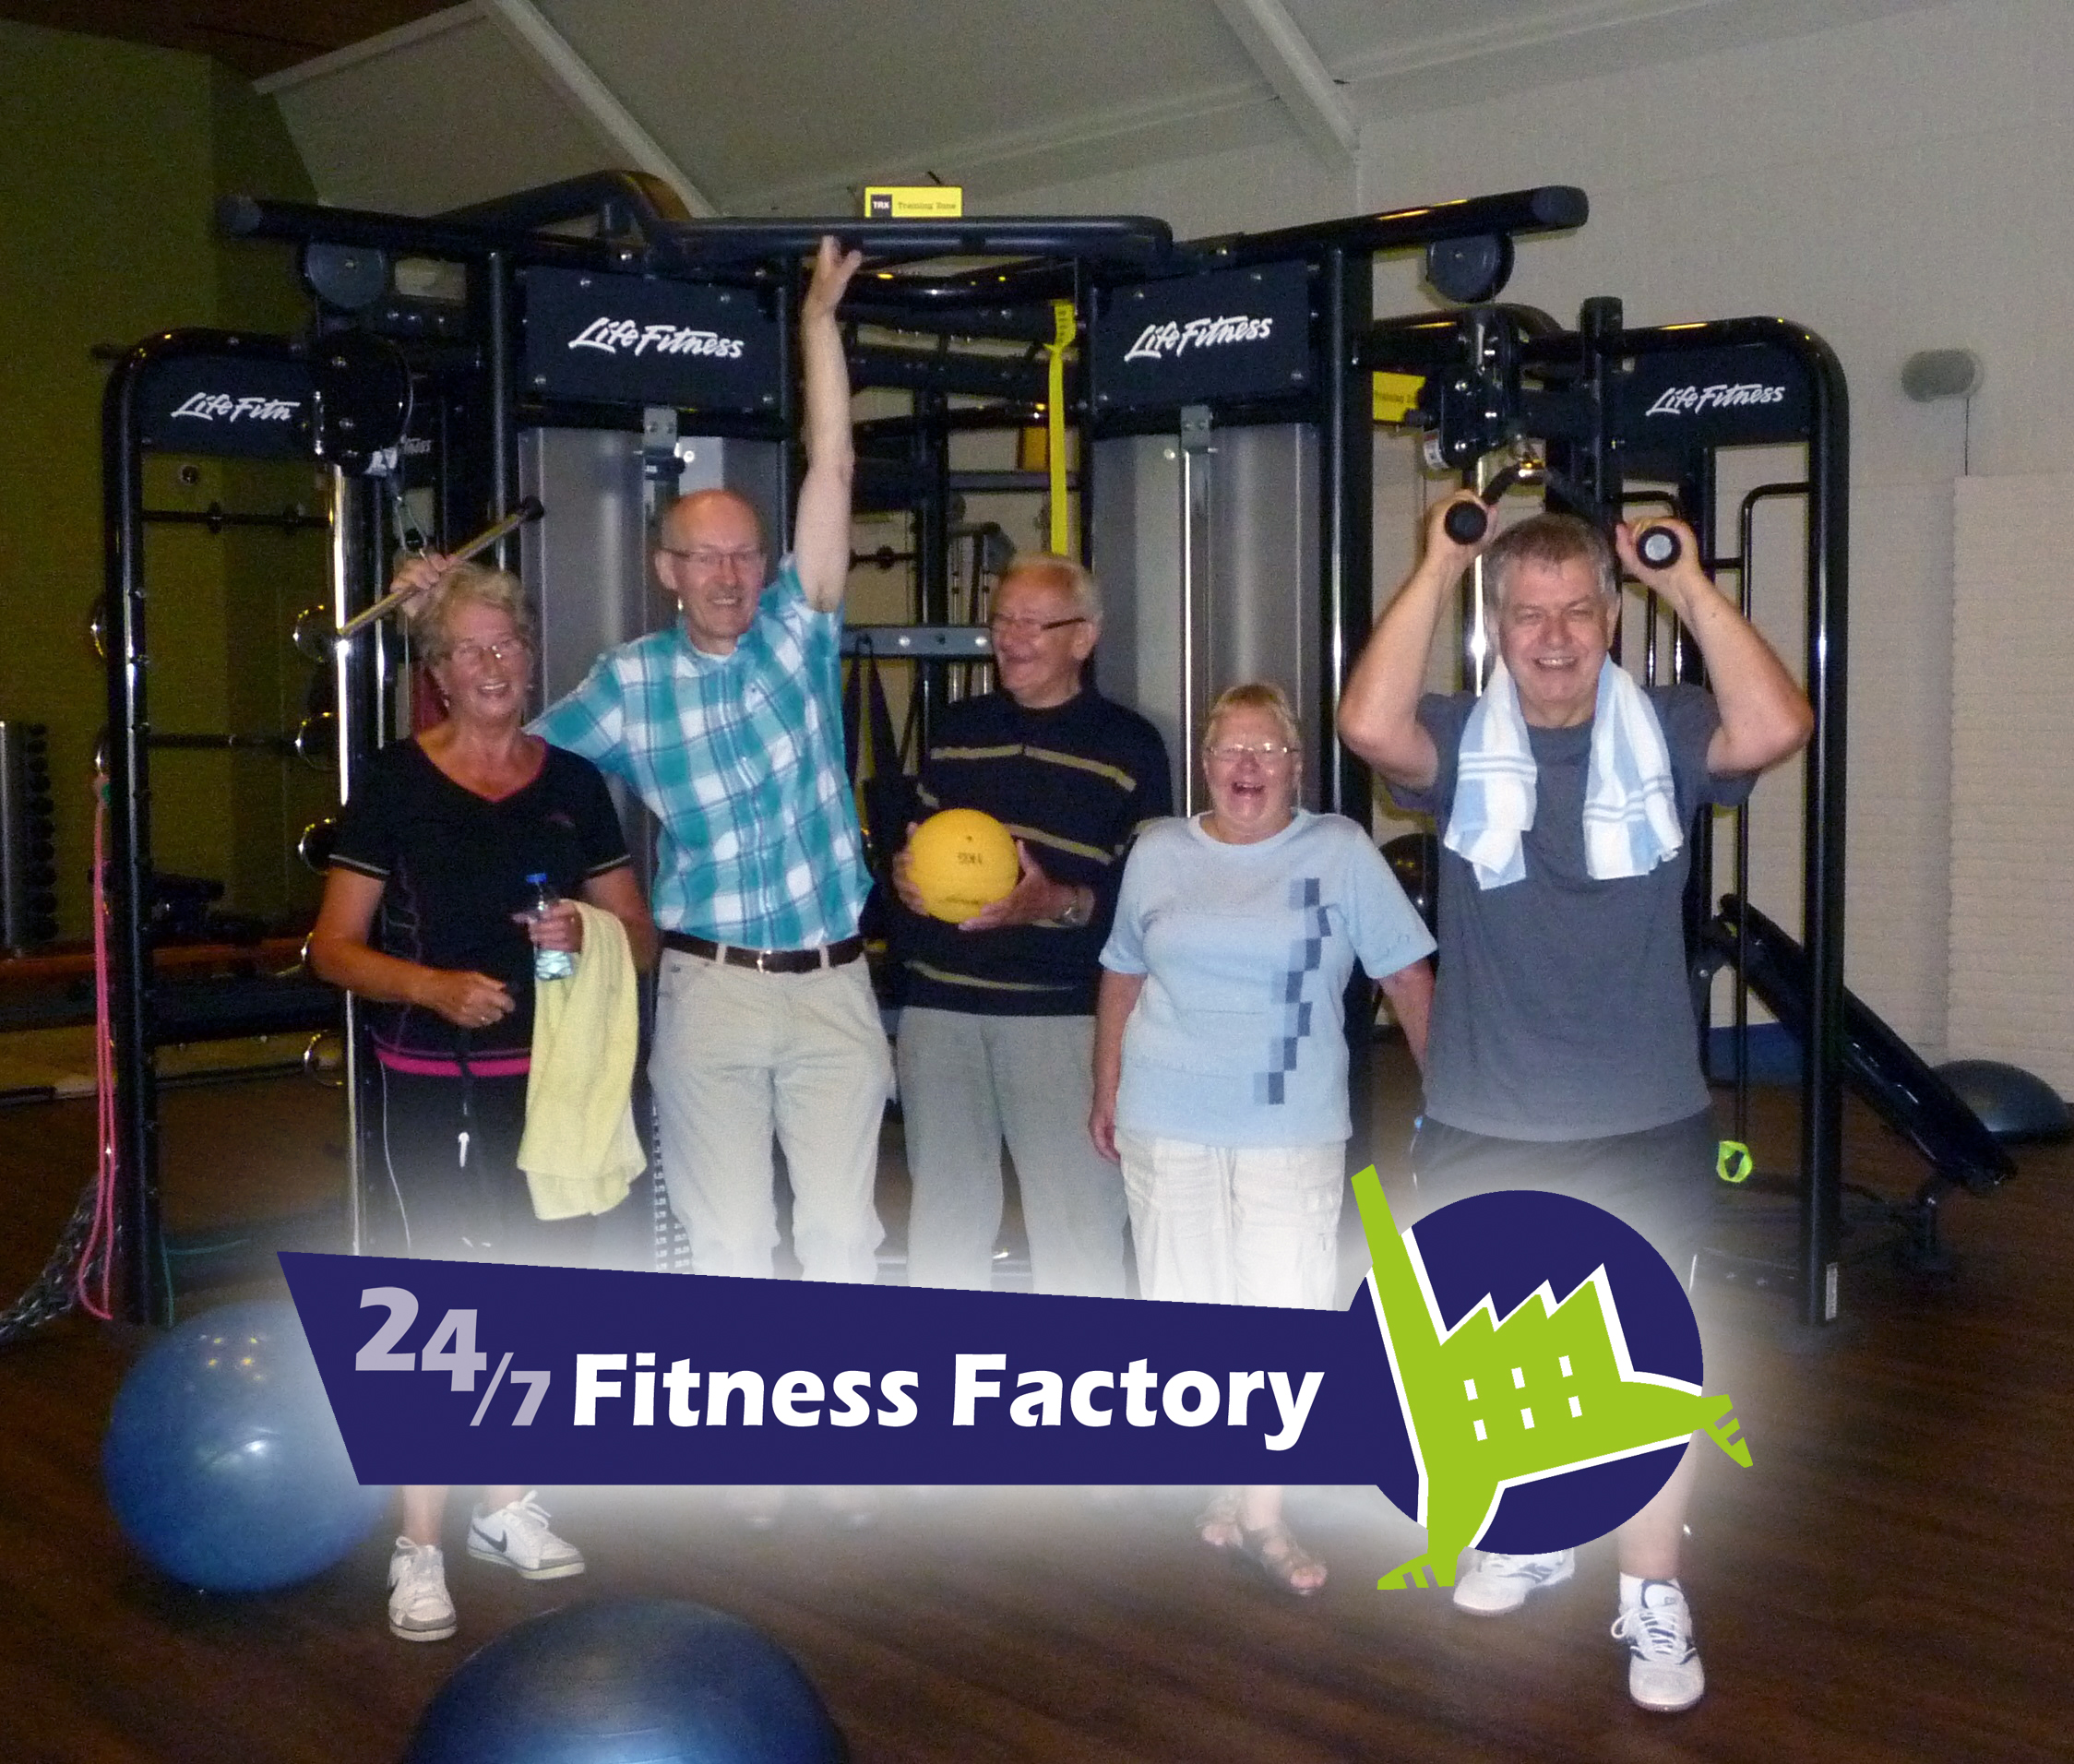 24 7 Fitness Factory Gorssel 60 Ffgorssel Copy 24 7